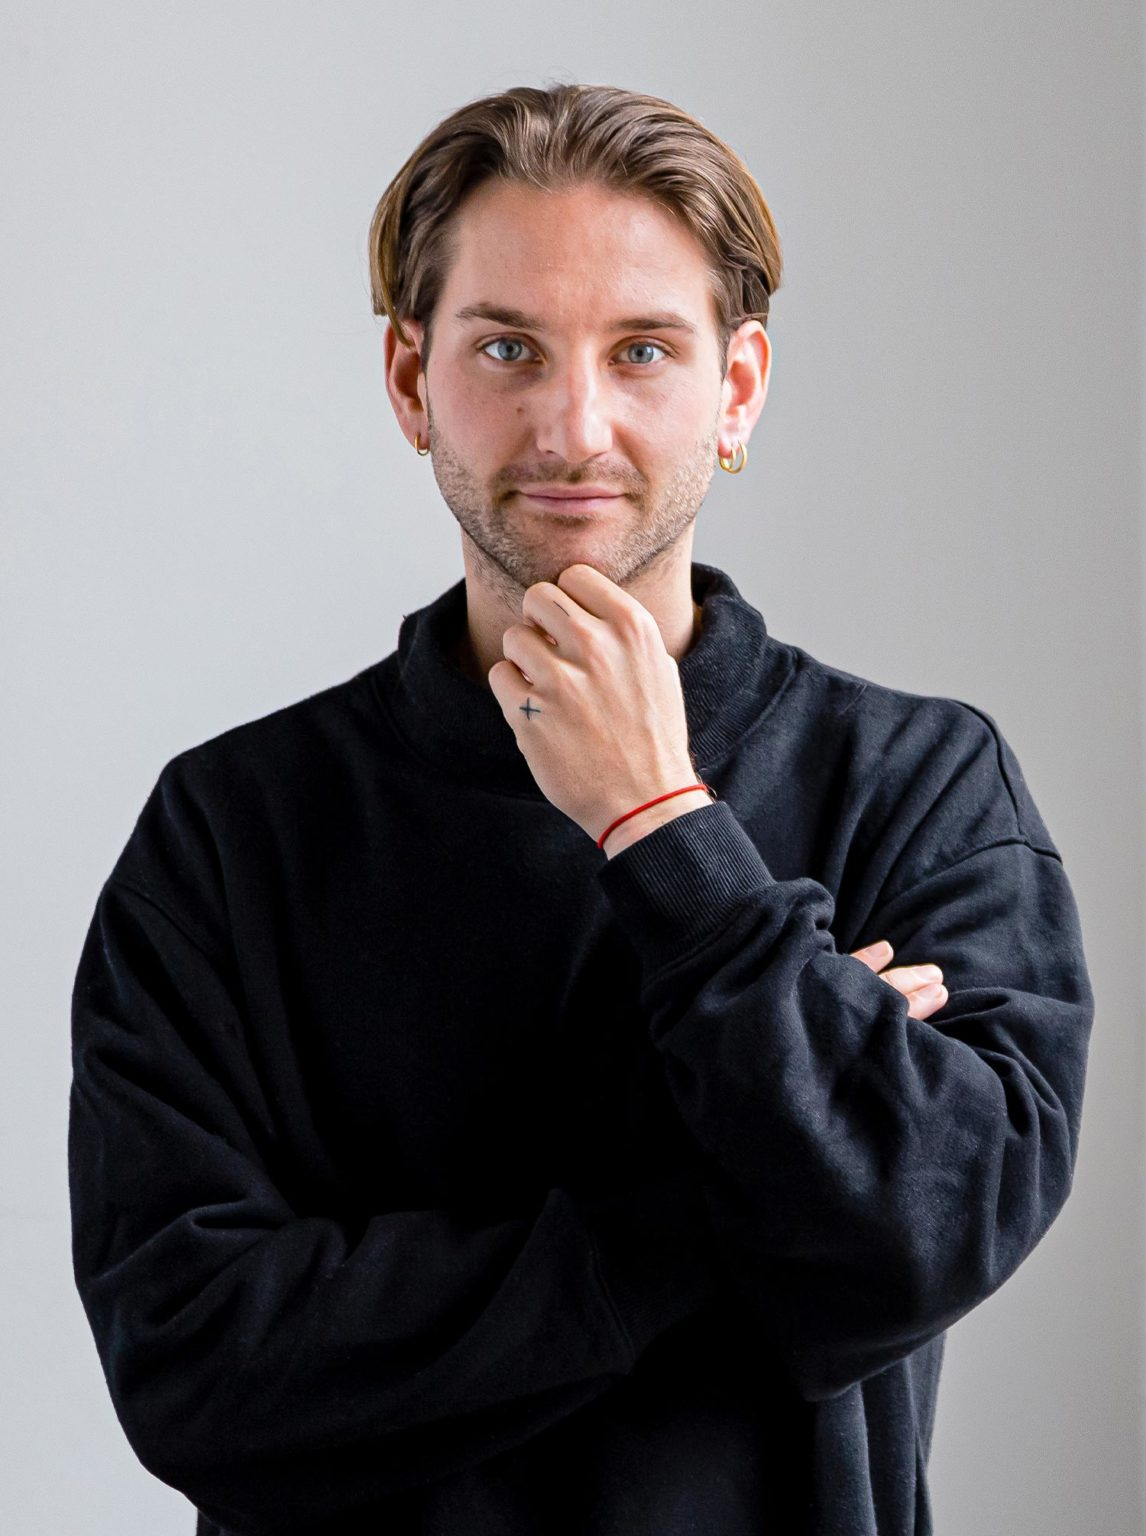 Simon - Senior Political Communication Manager